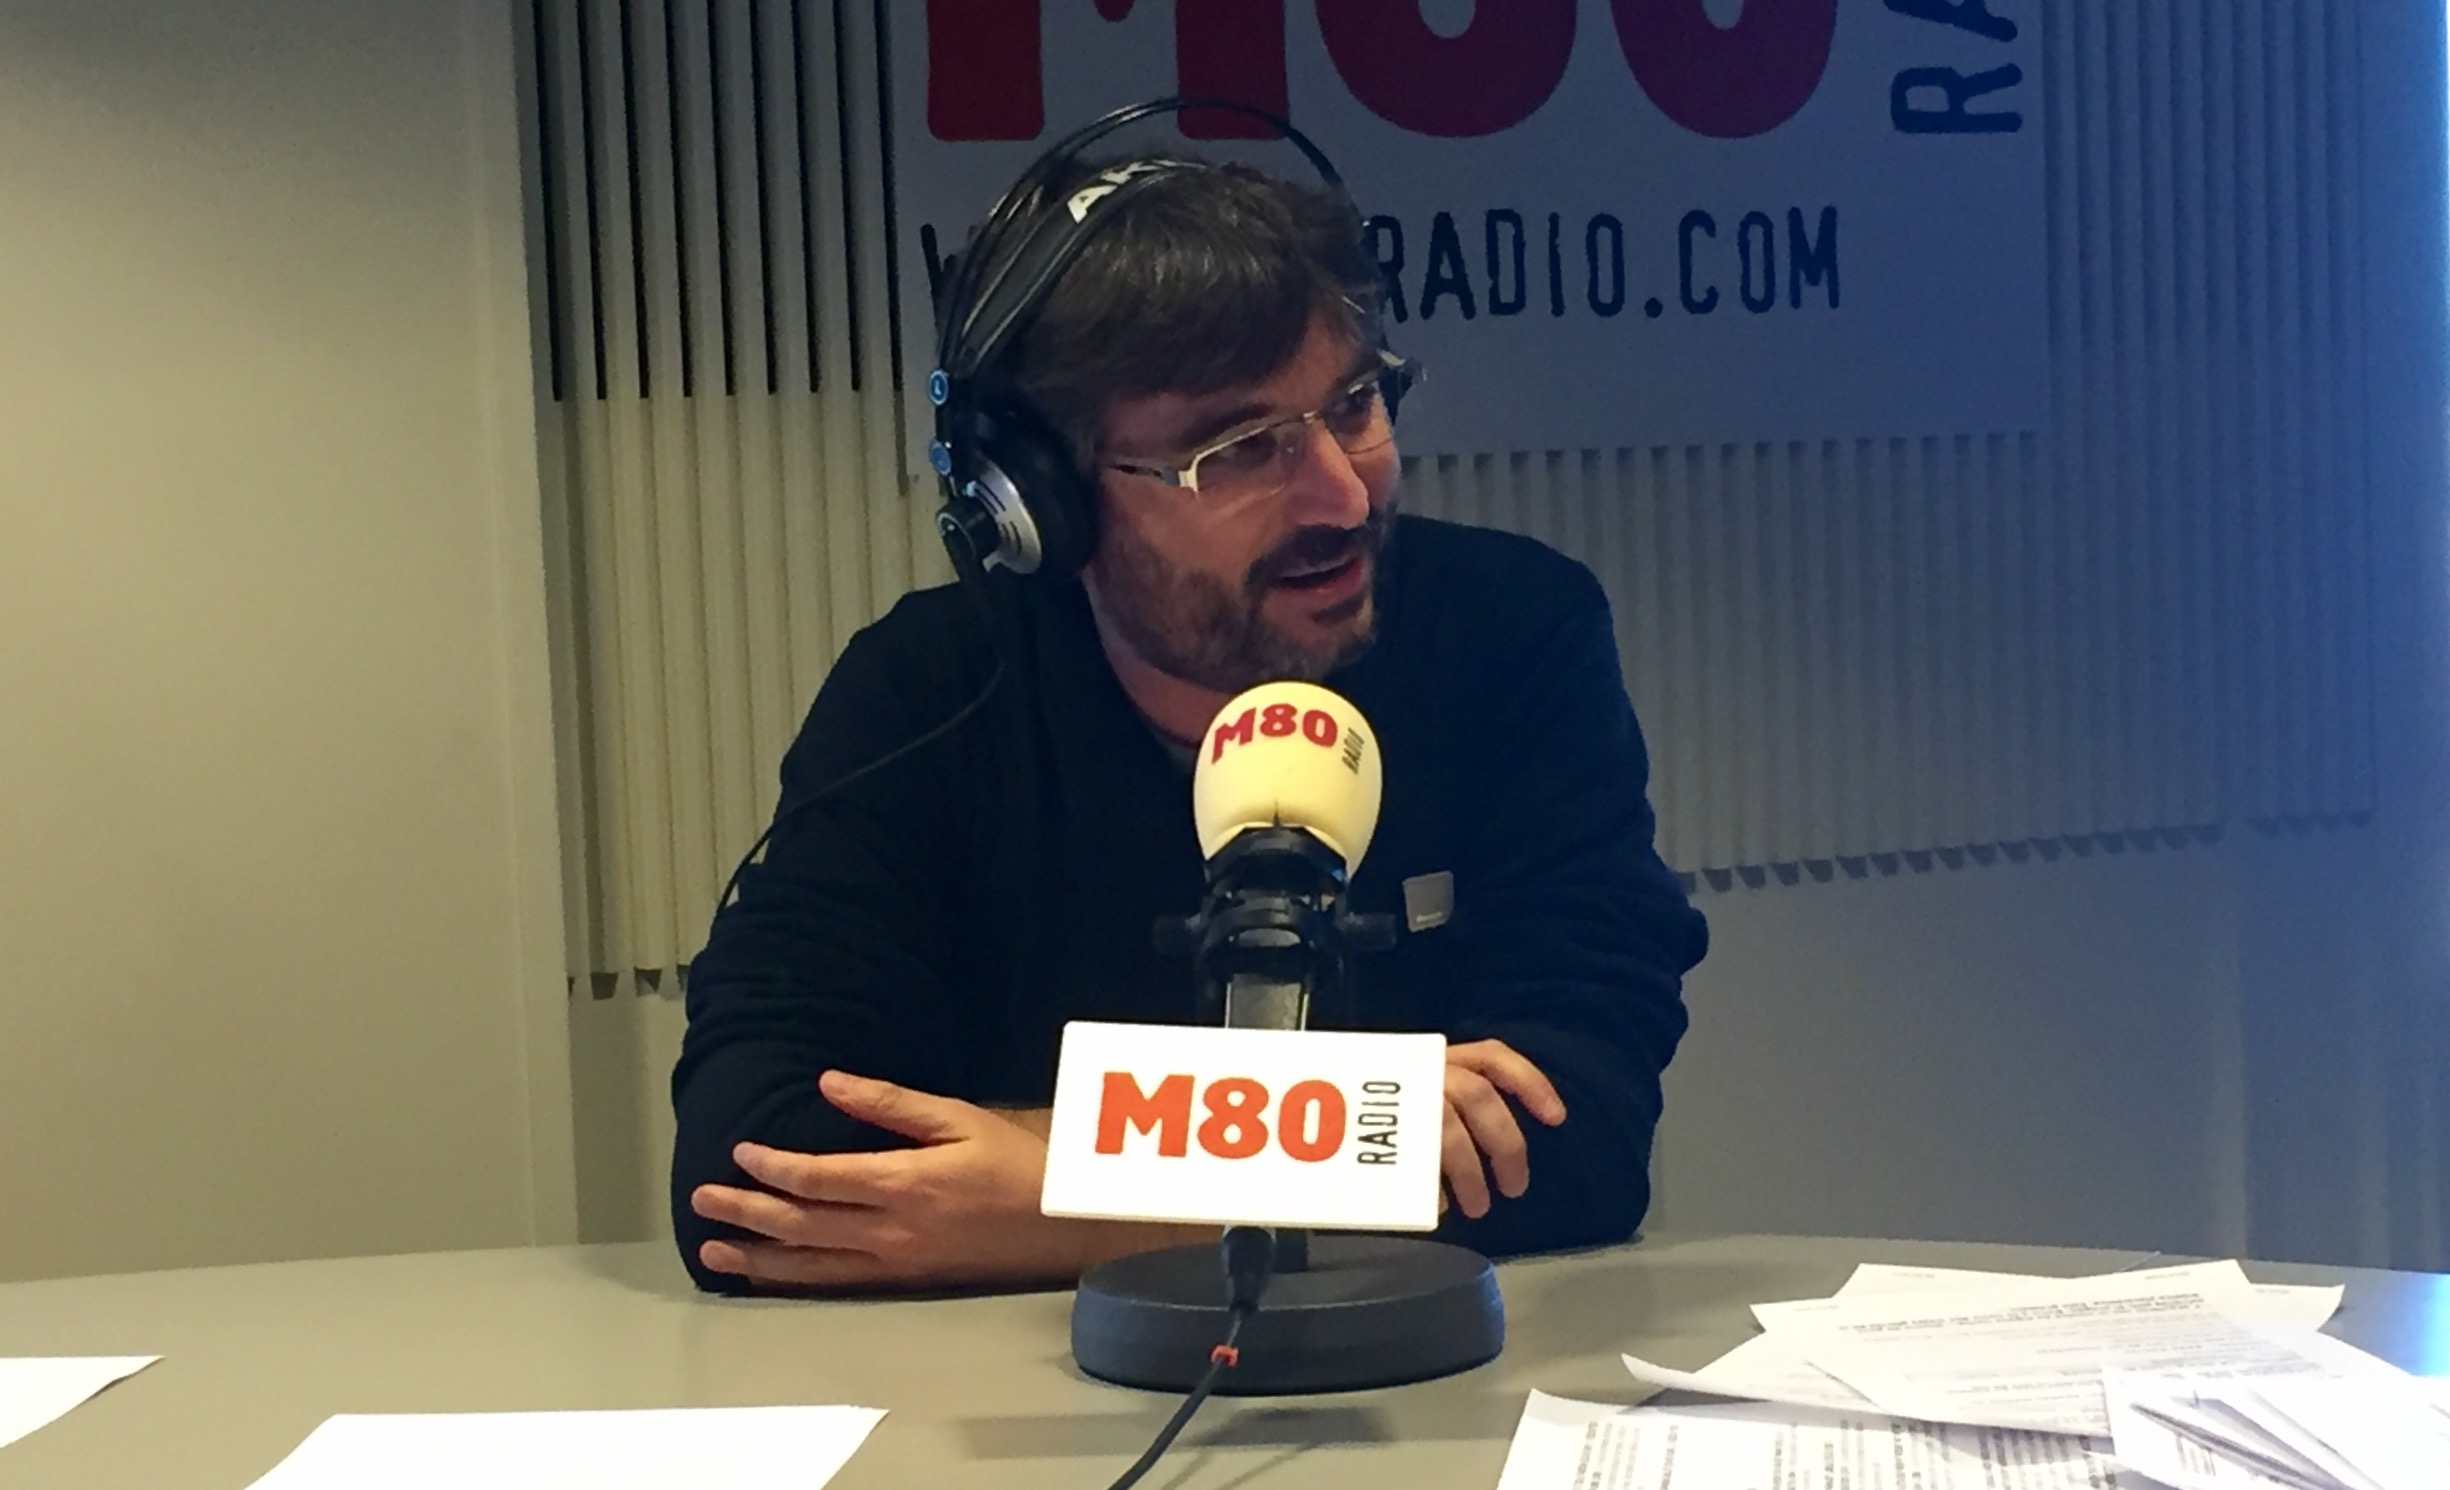 Jordi Evole Si Fuera El Rey Llamaria A Rastreator Para